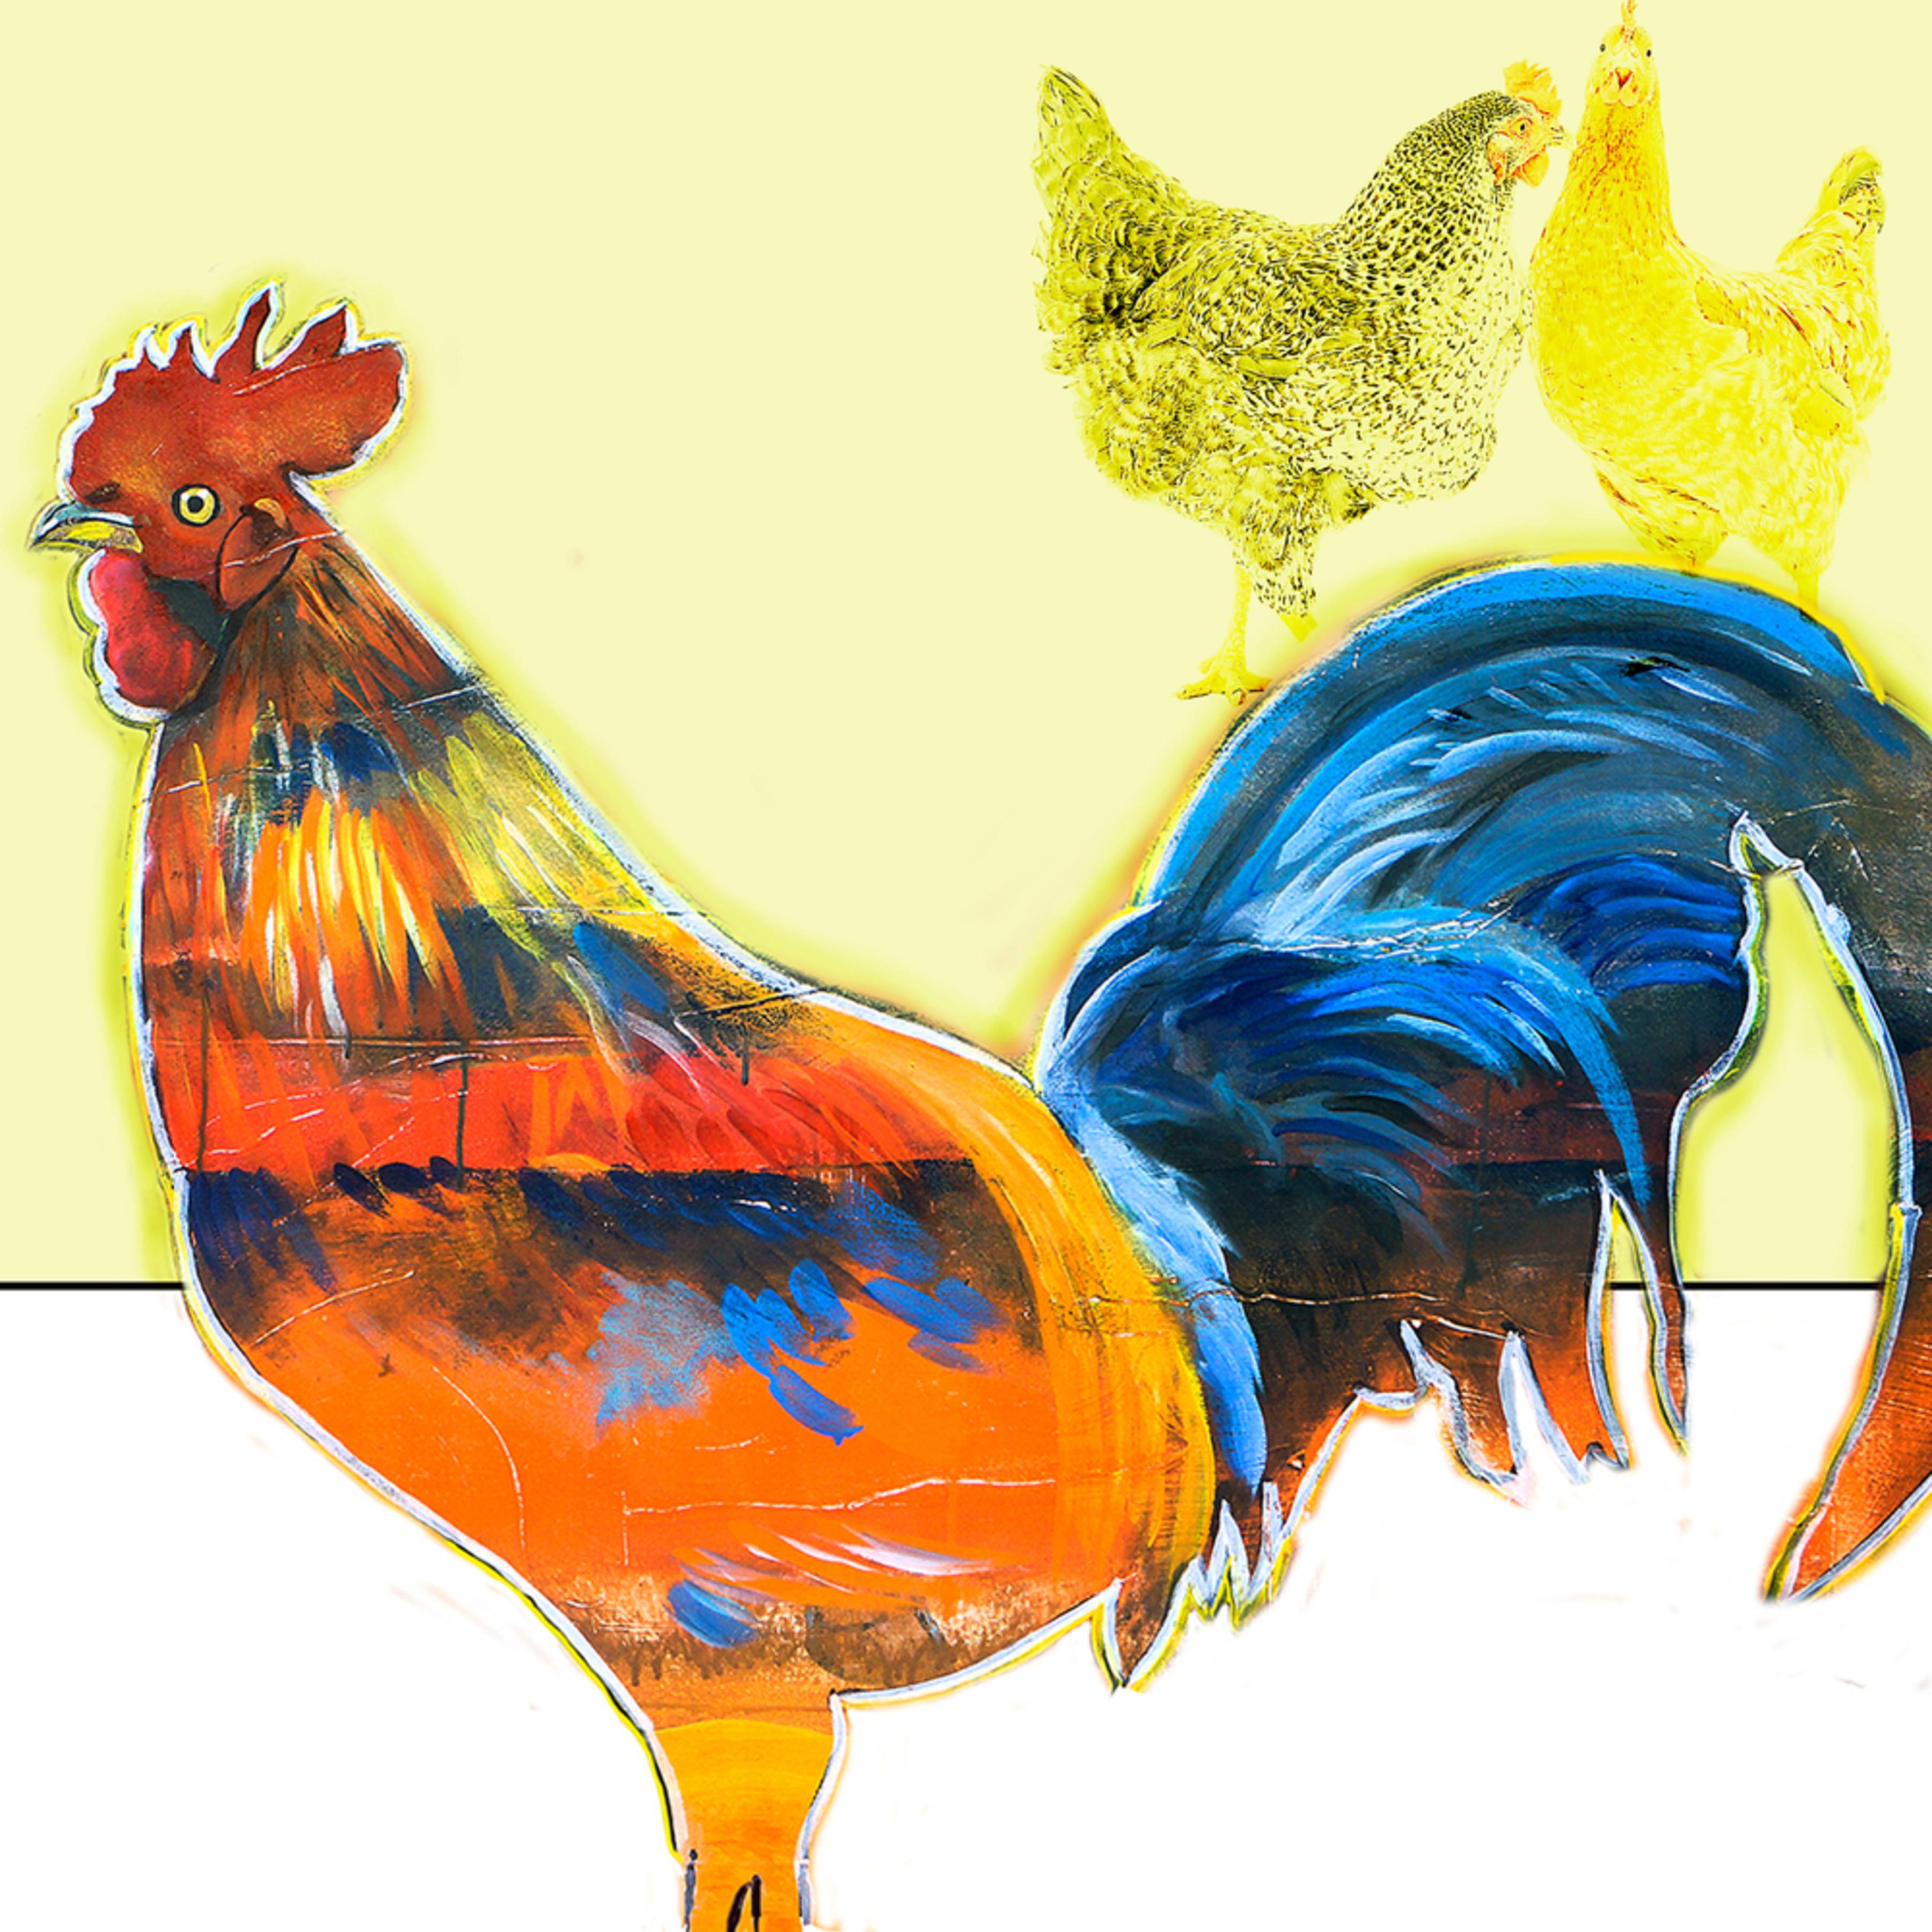 Rooster square b chickens jc22vl